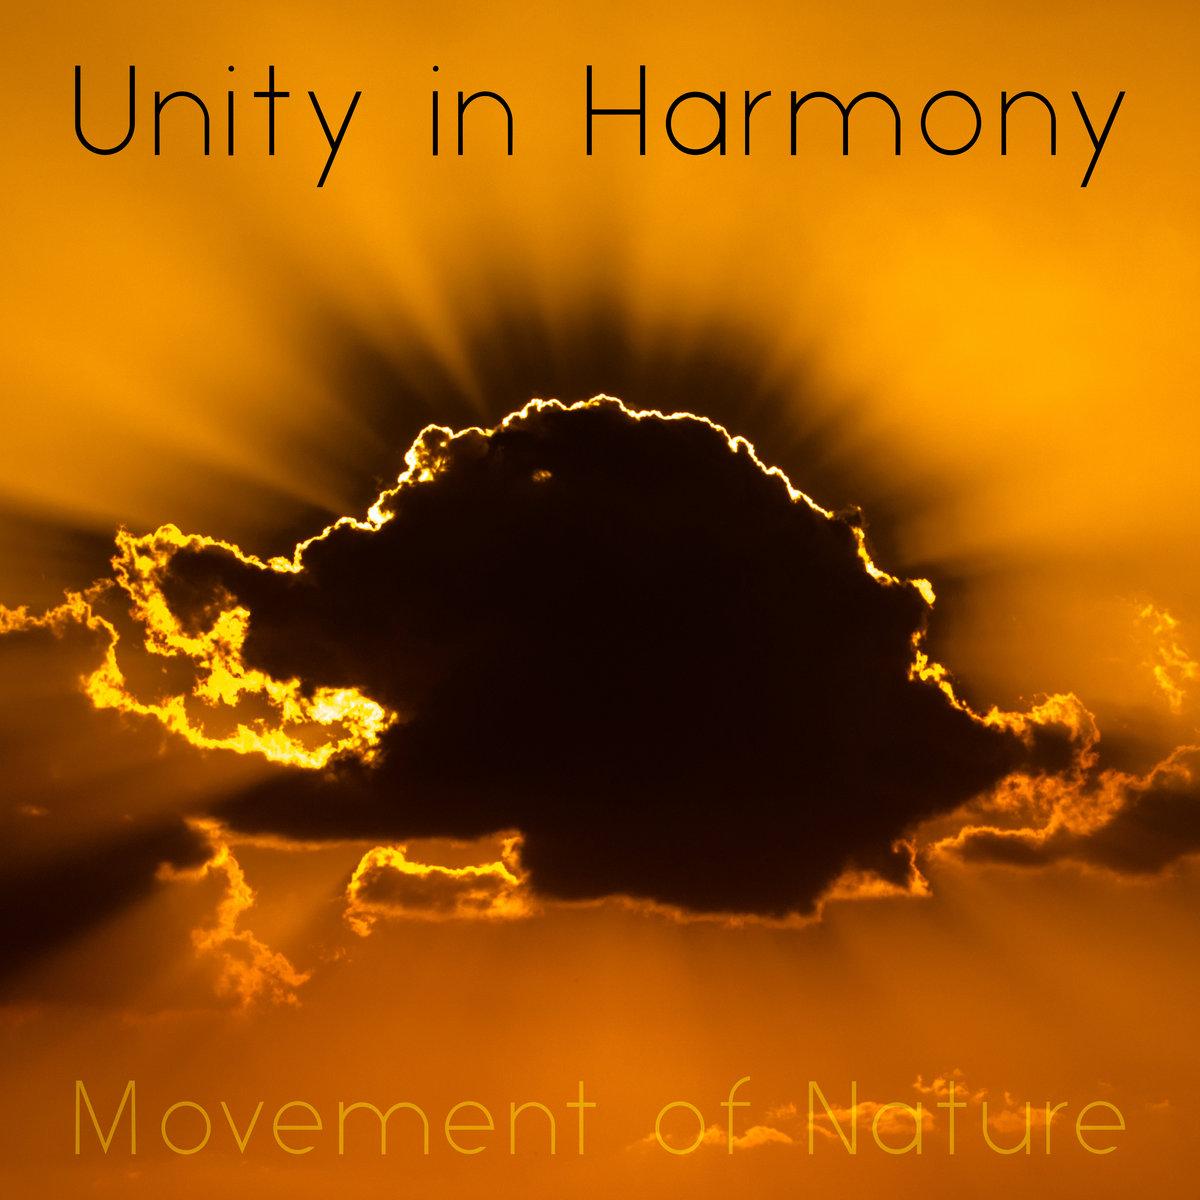 Unity in Harmony - Movement of Nature | Unity in Harmony